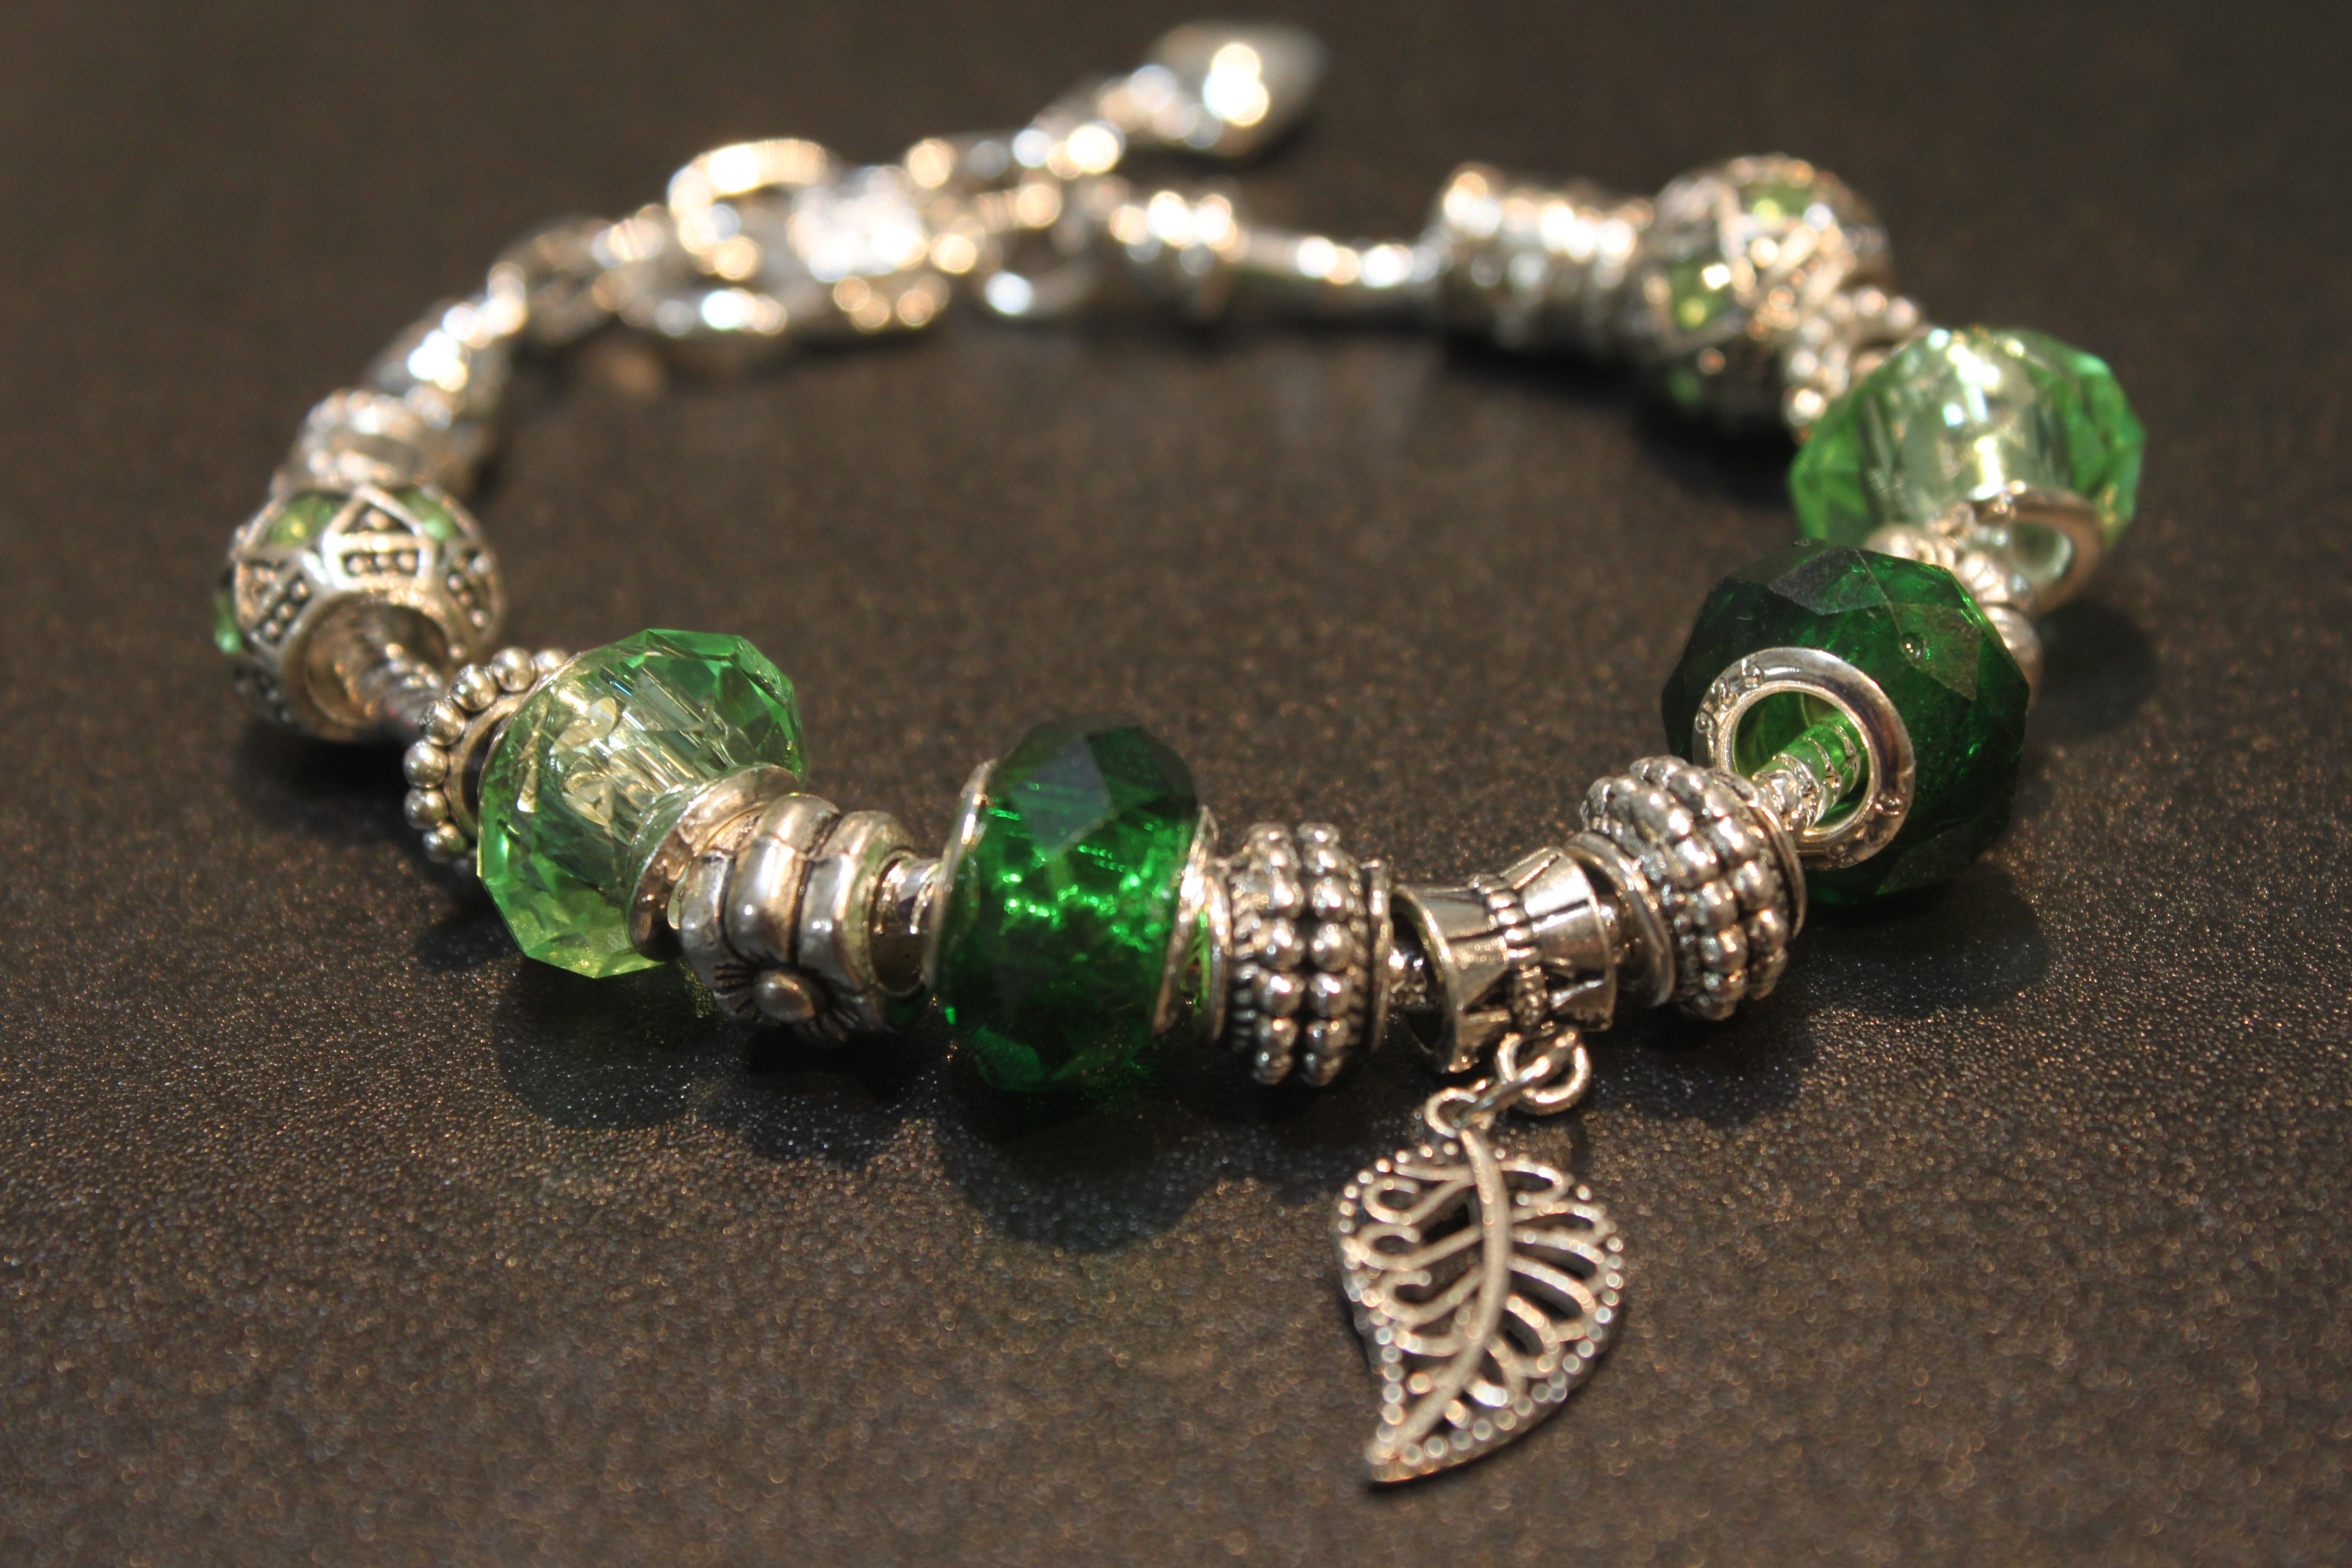 Leave charm bracelet - Grass Green